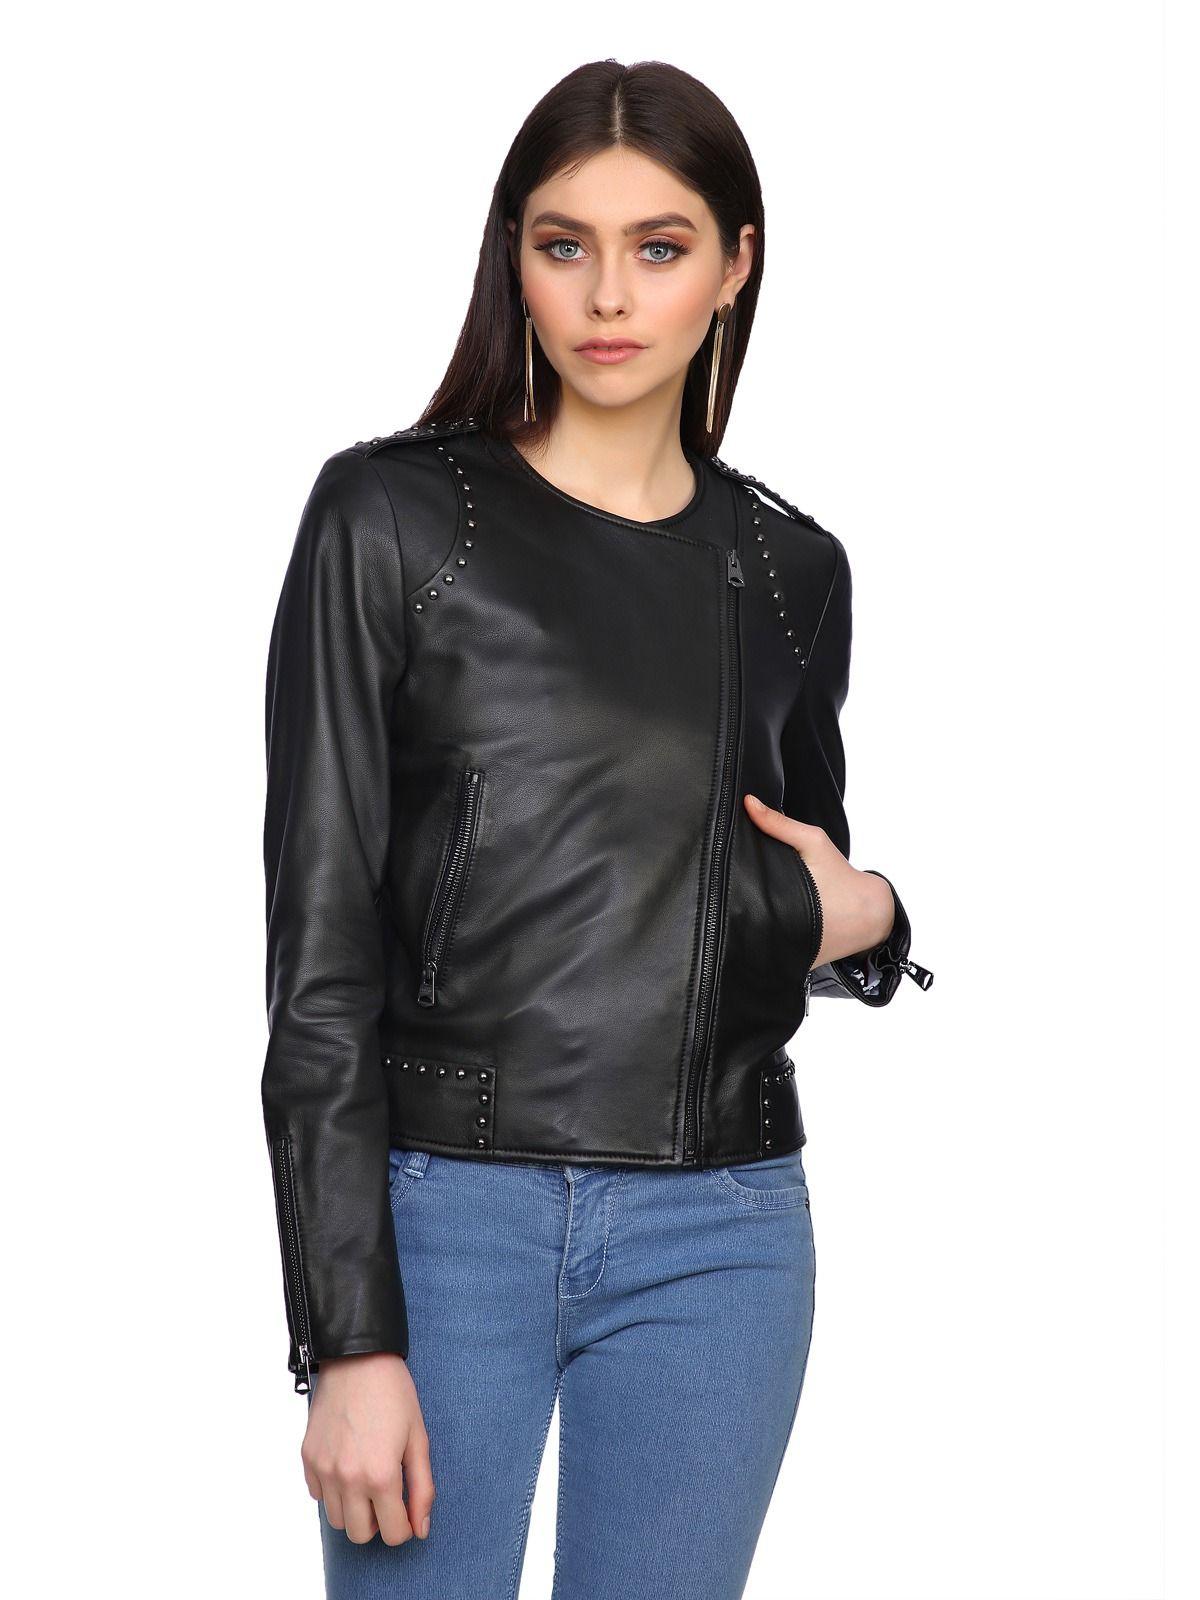 Studded Collarless Leather Biker Jacket Elegant Jacket Jackets Leather [ 1600 x 1200 Pixel ]